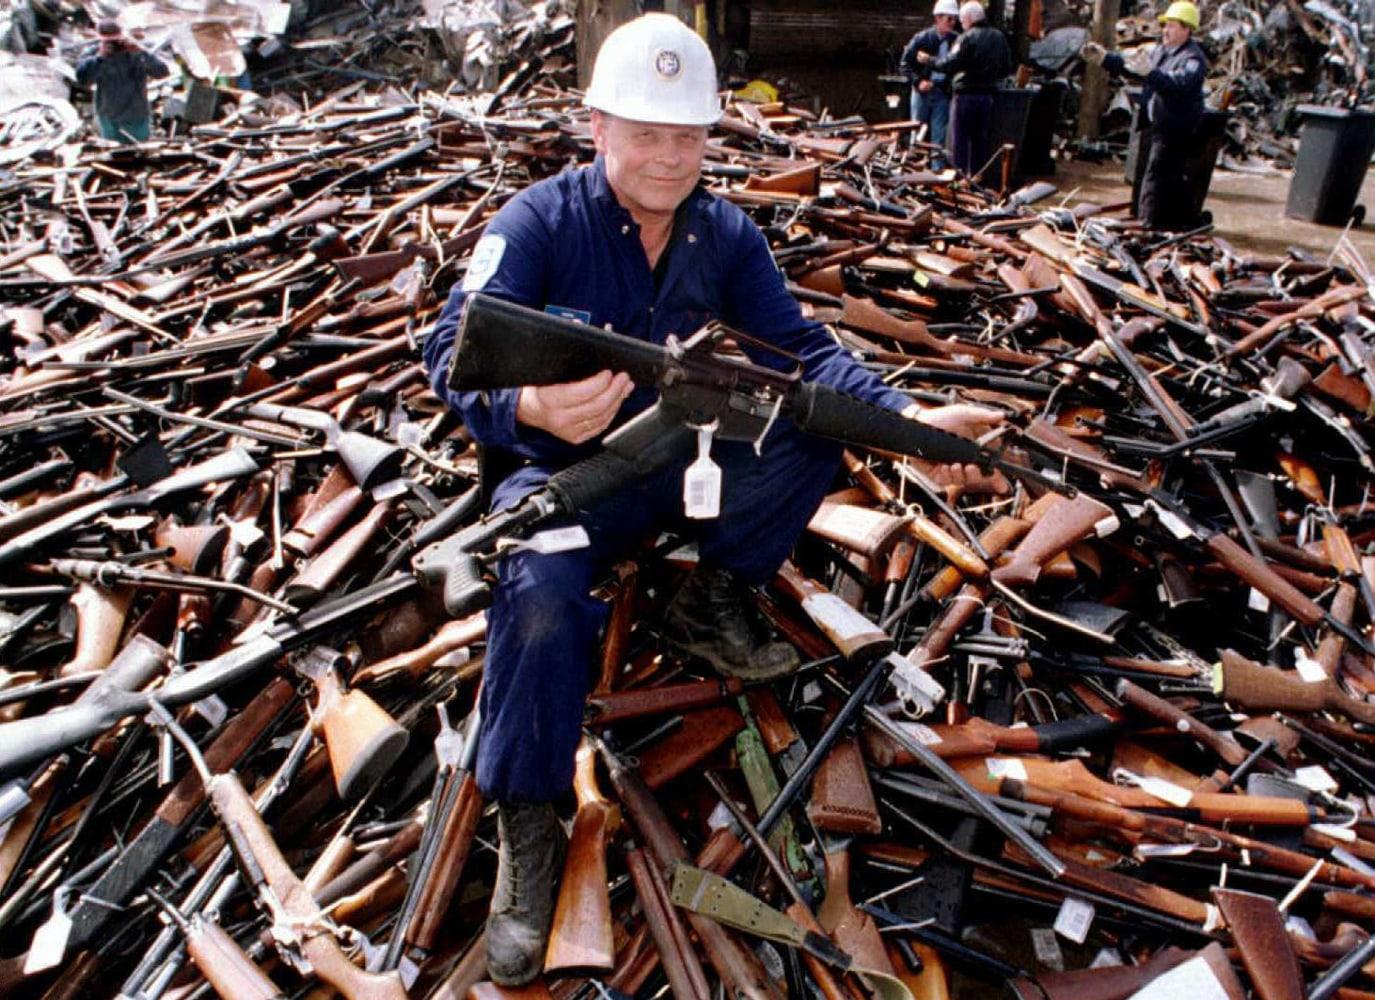 Port Arthur Australia  city images : Port Arthur Massacre: The Shooting Spree That Changed Australia Gun ...